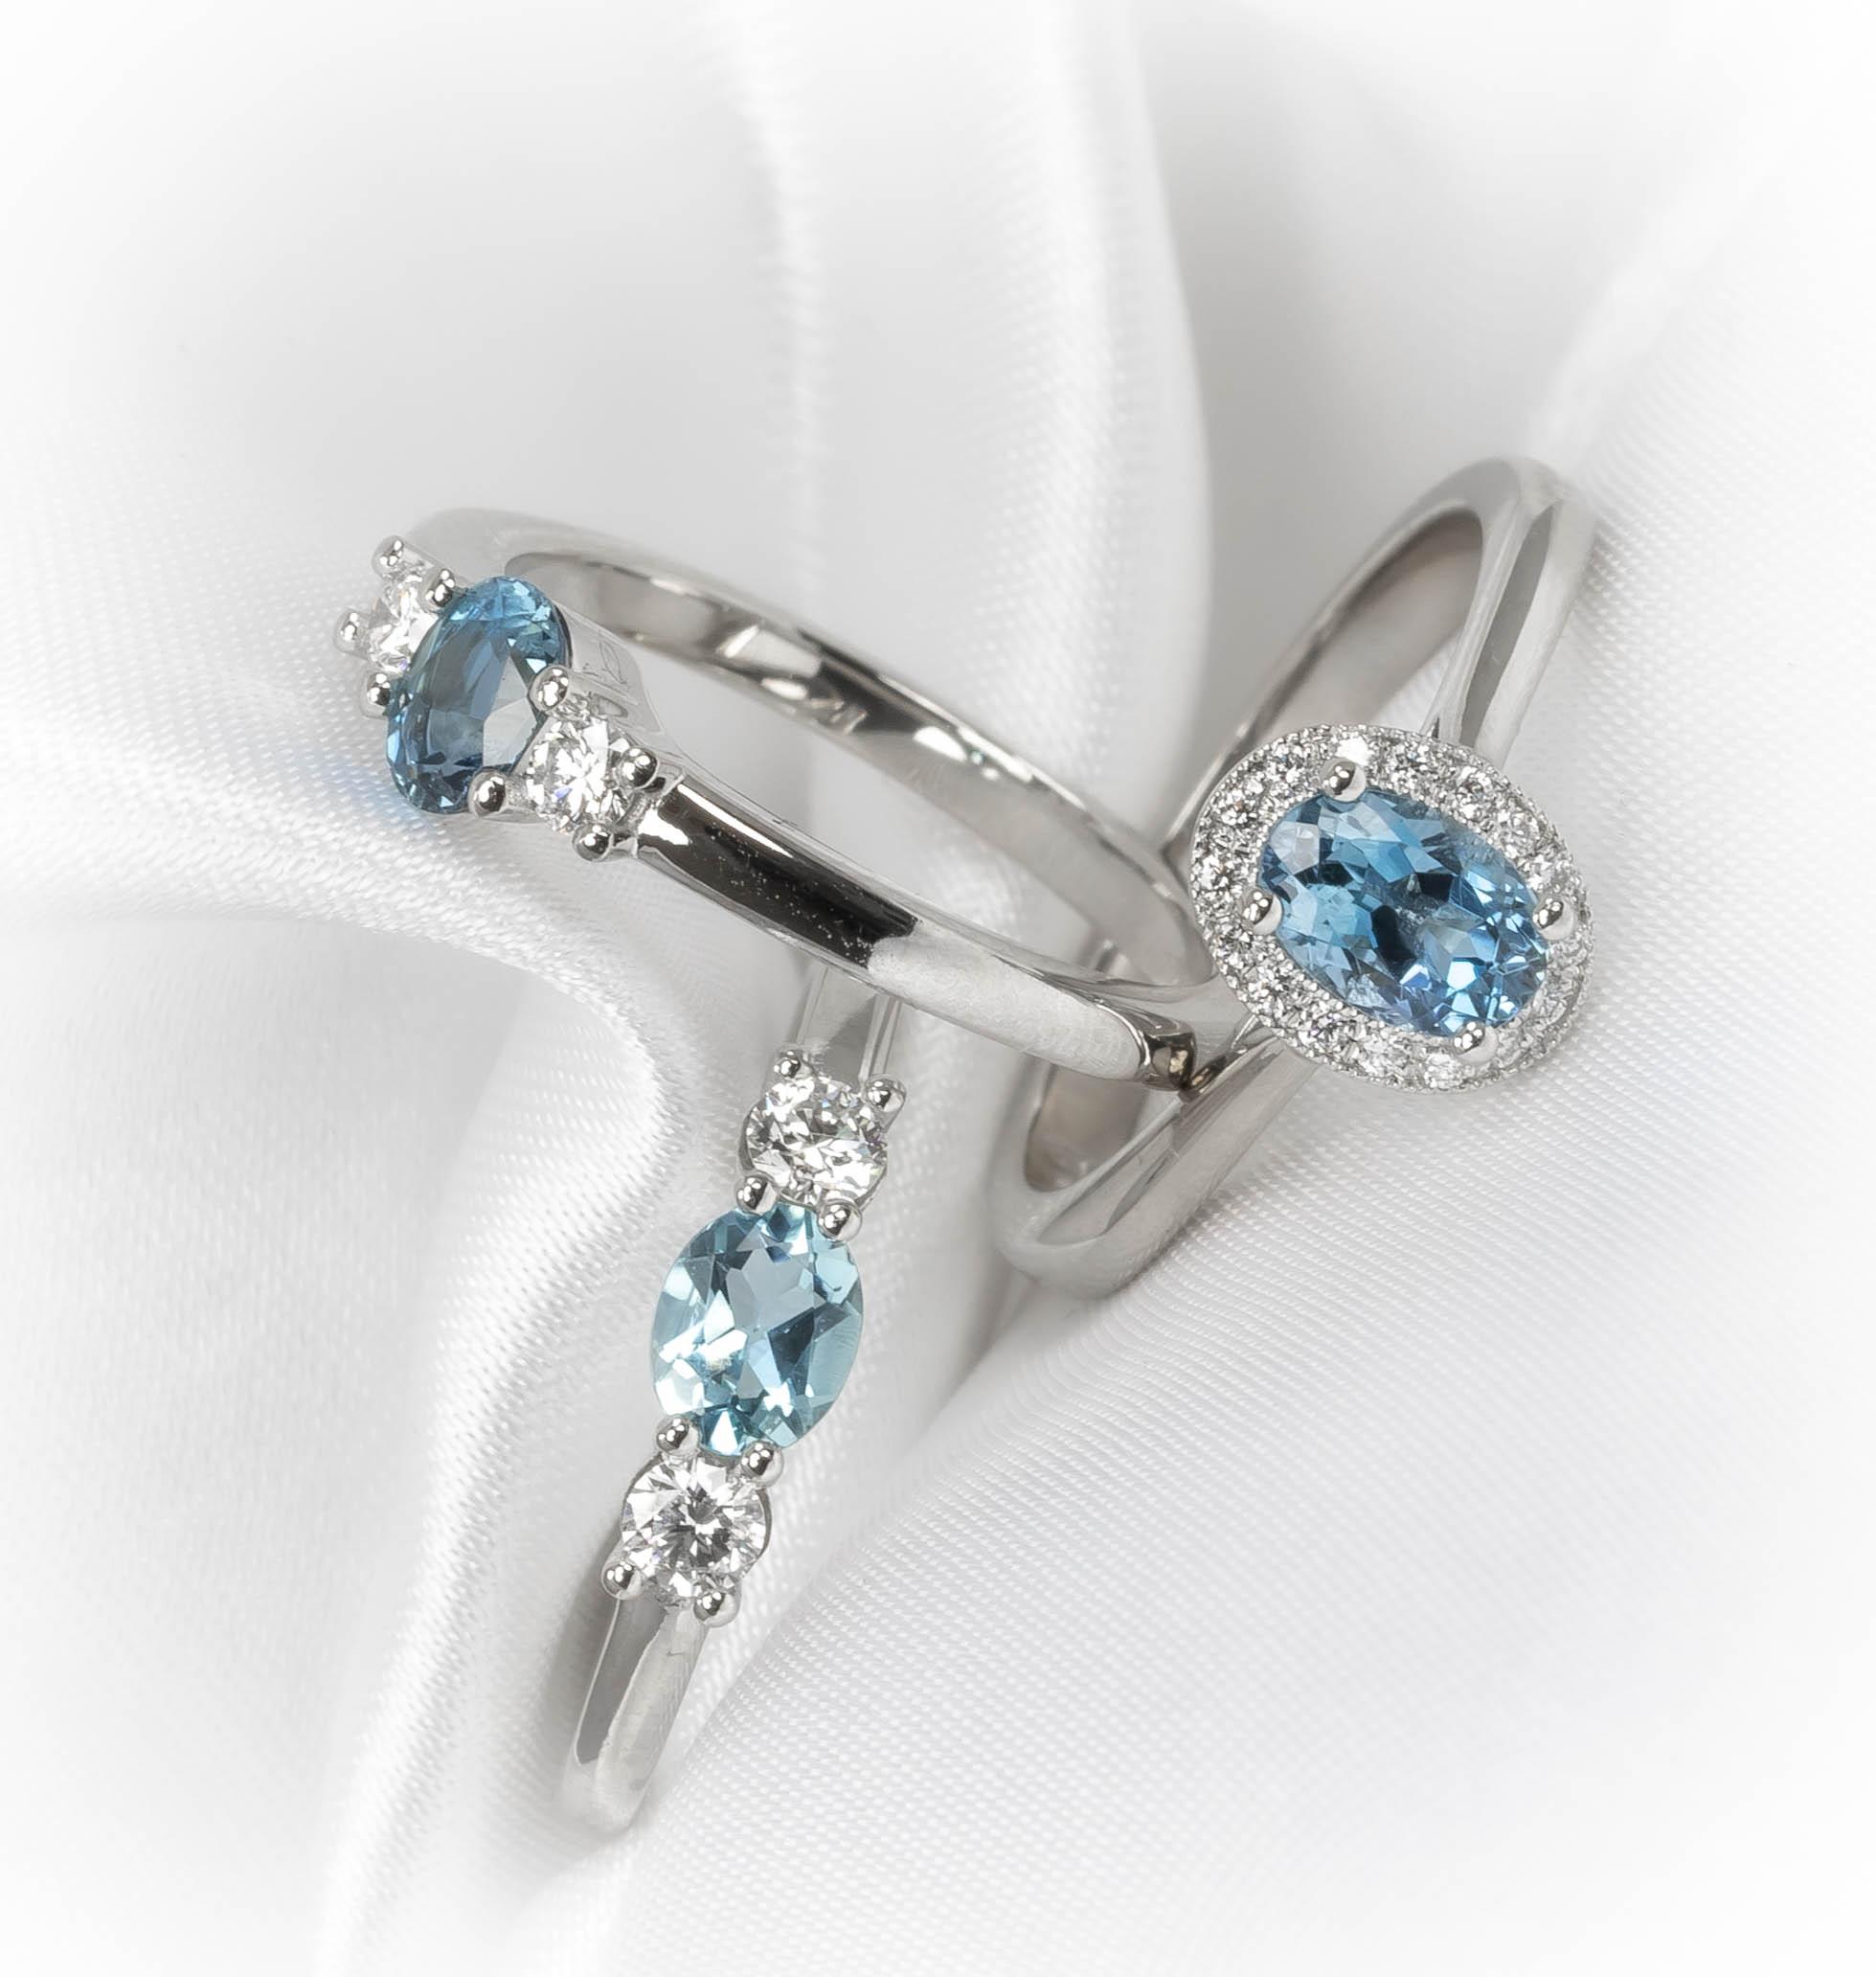 _MG_5380.jpgPlatinum mounted aquamarine and diamond set rings. Made in Chichester, England.